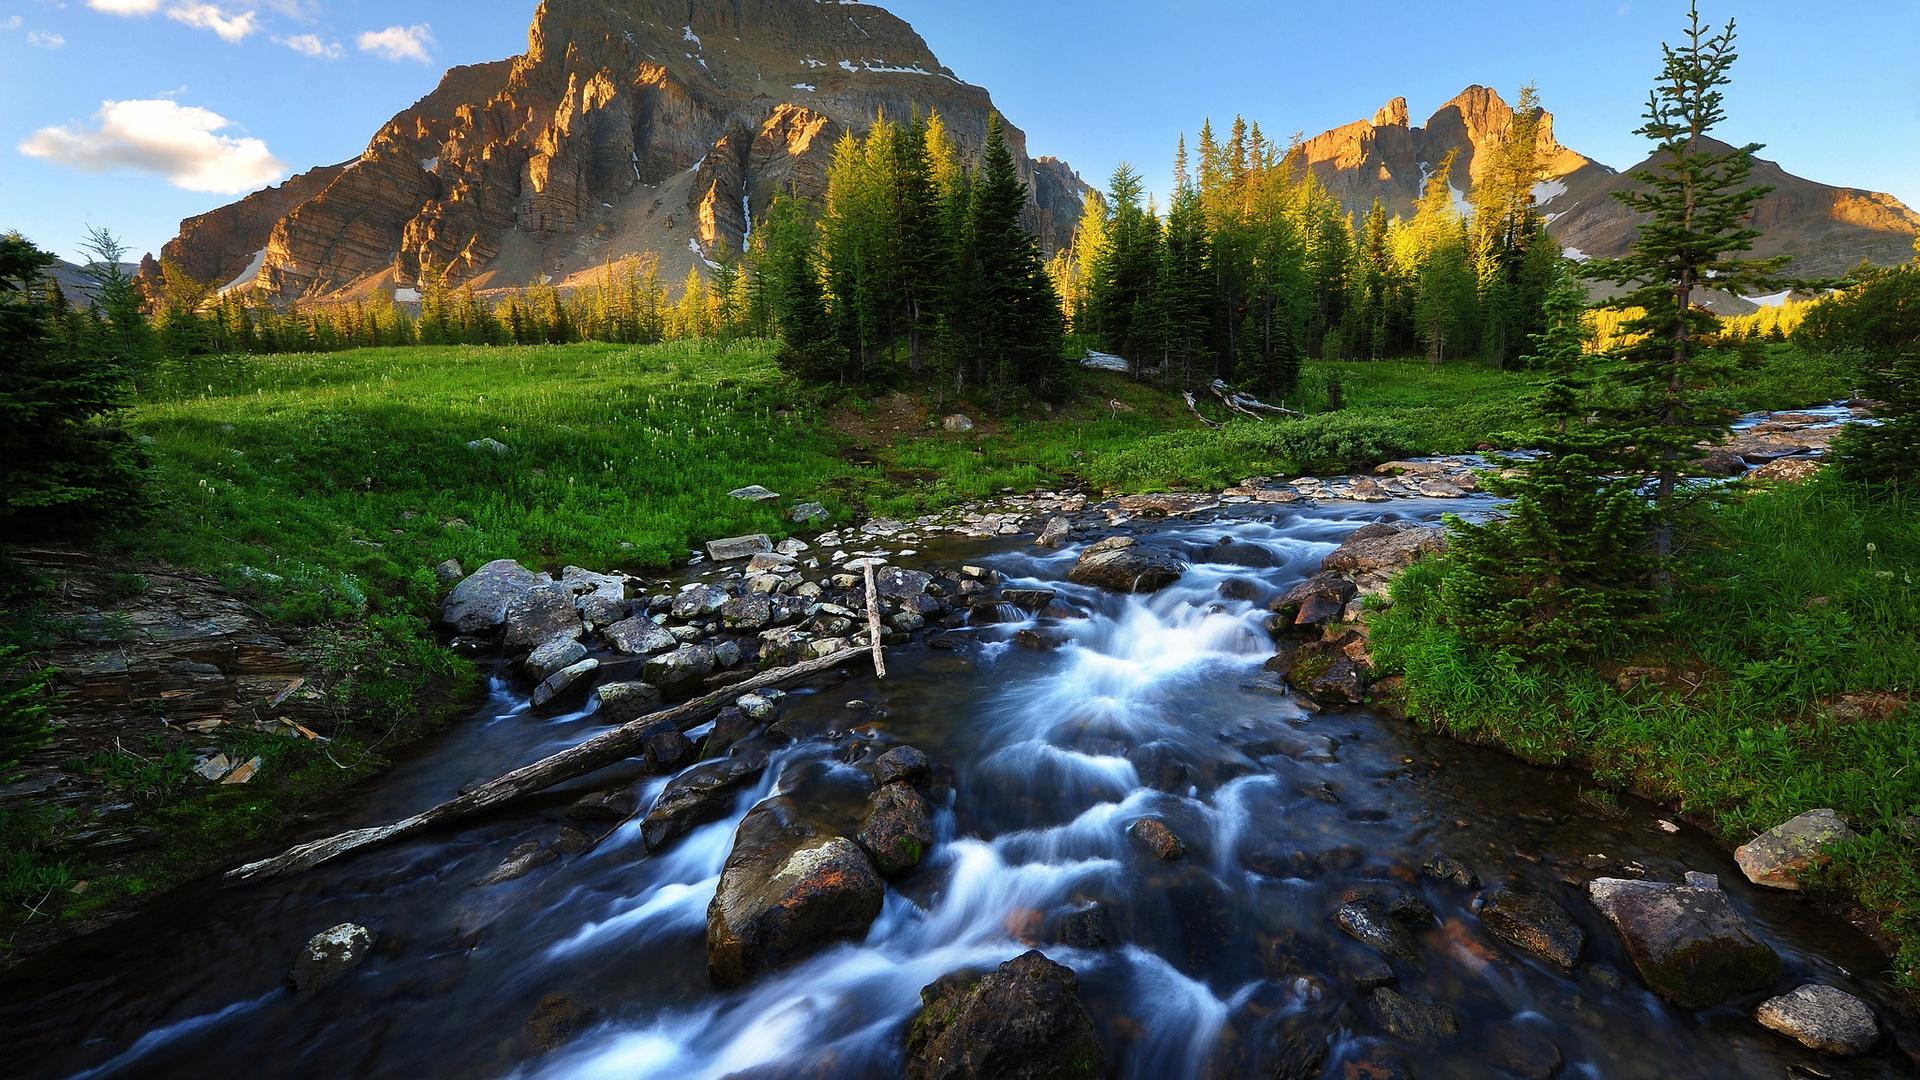 Hd wallpaper river - Hd Wallpaper River Beautiful River Hd 1080p Wallpapers Download